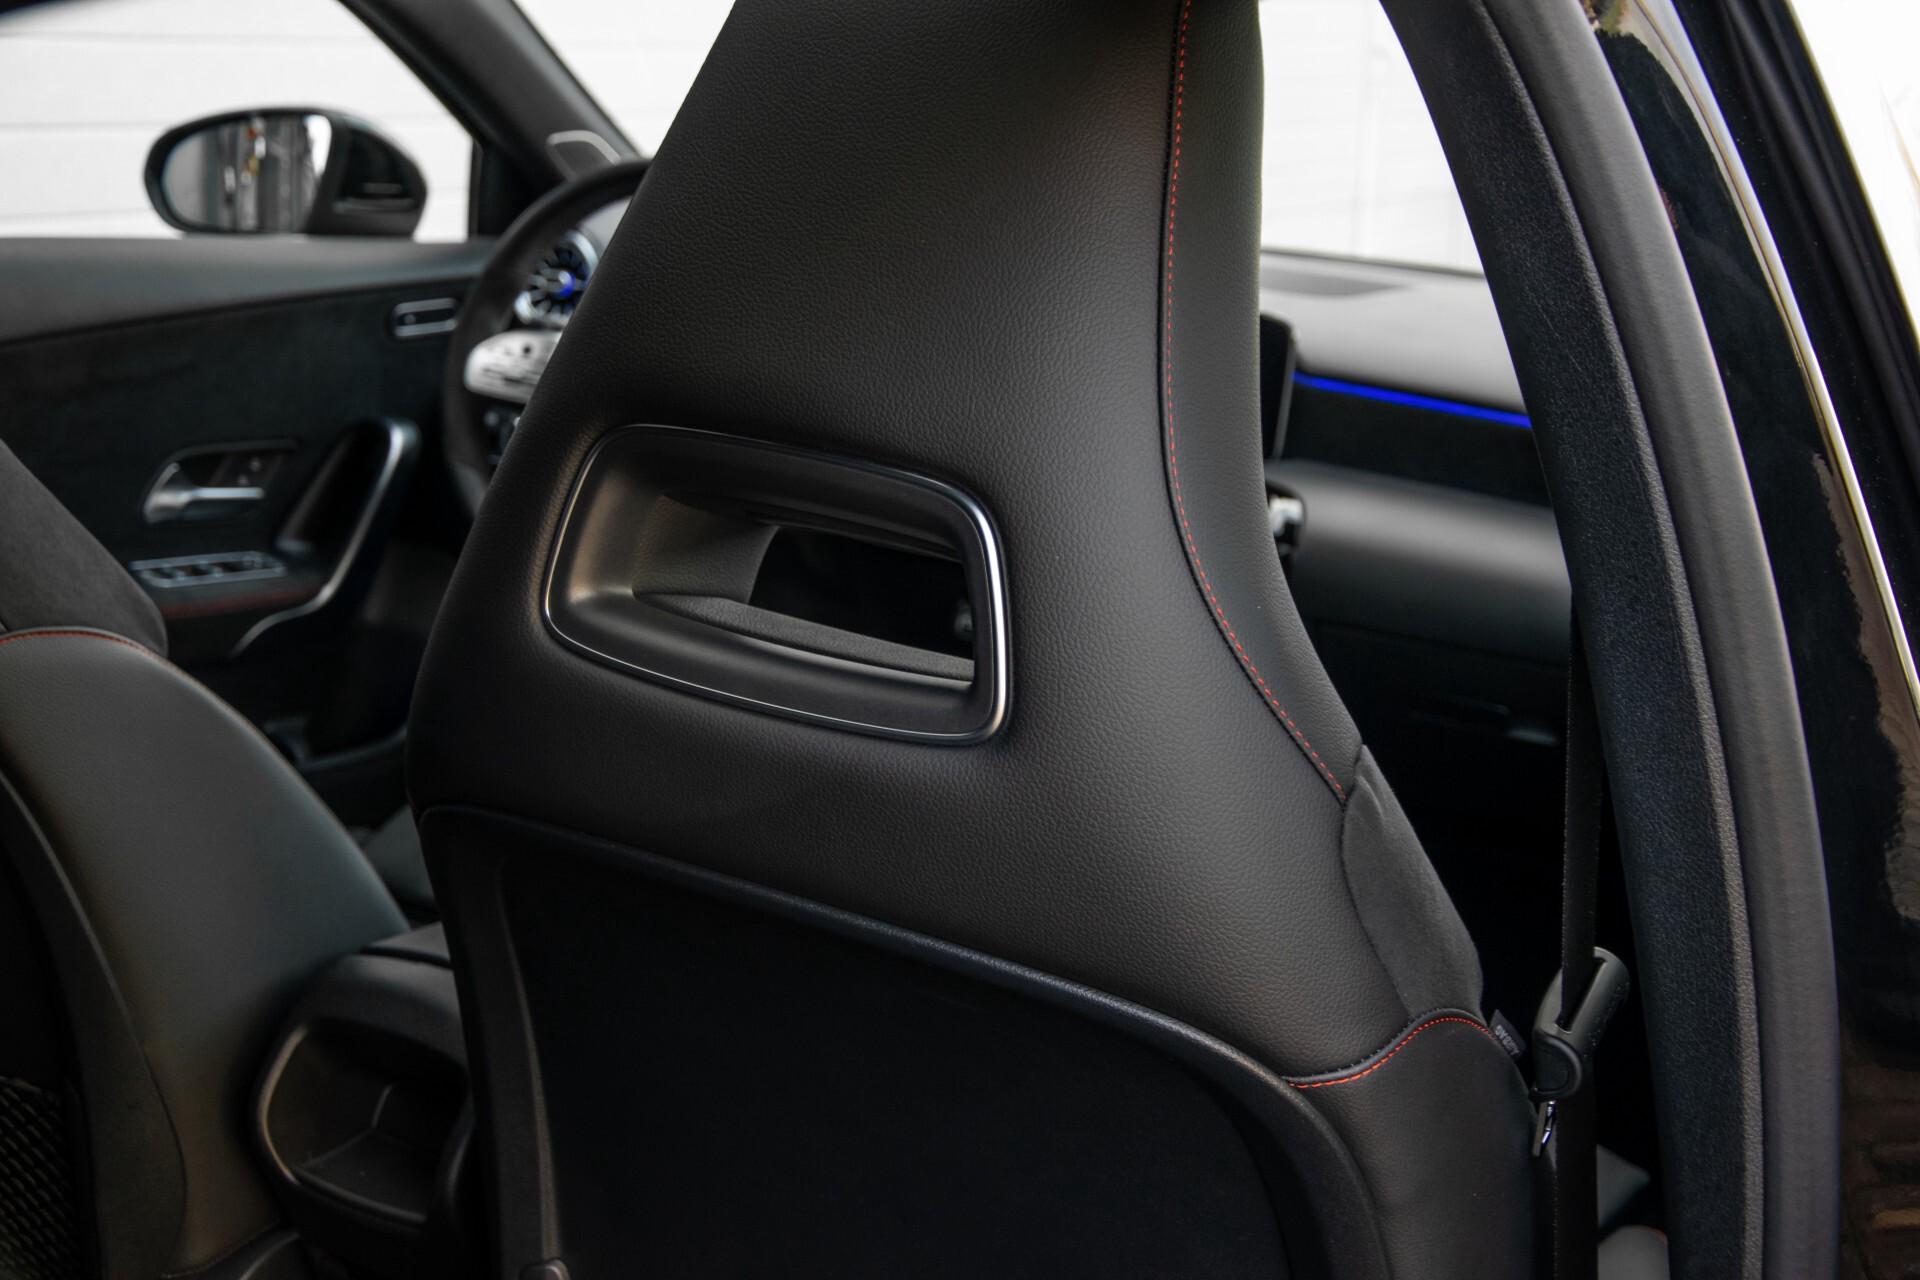 Mercedes-Benz A-Klasse 250 4-M AMG Panorama/Keyless-Entry/MBUX/HUD/Burmester/360/Multibeam LED Aut7 Foto 45